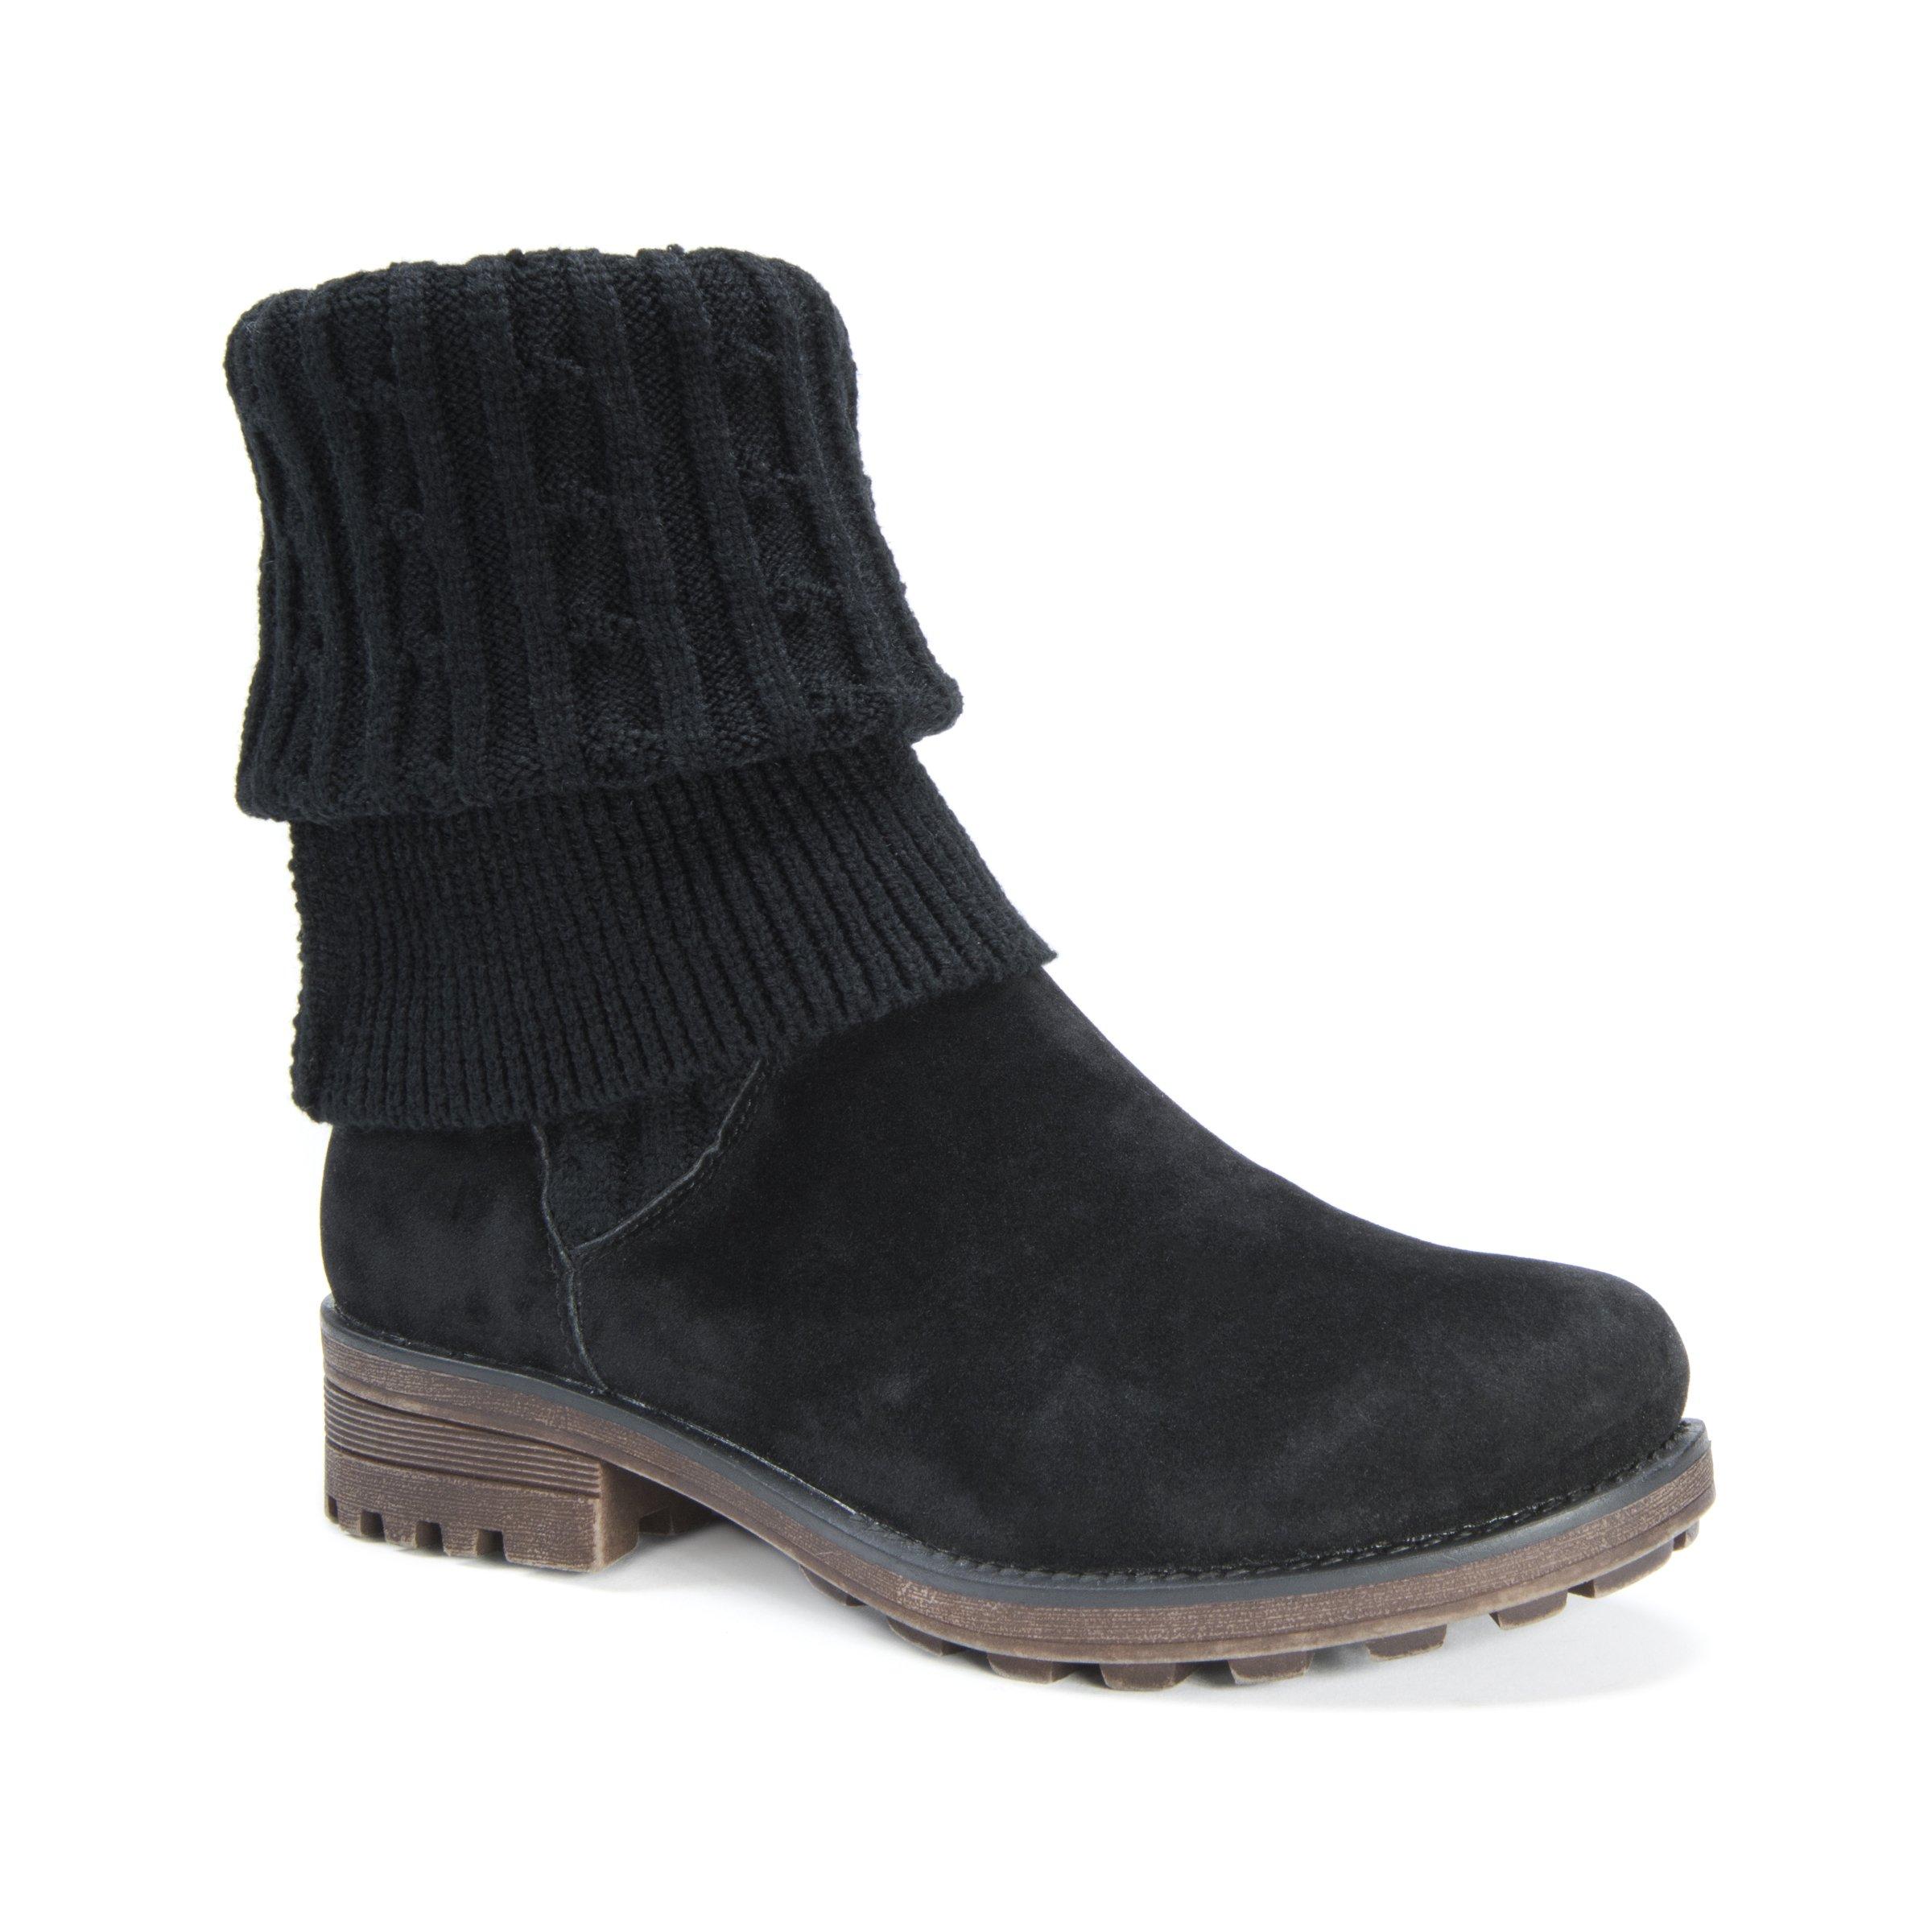 MUK LUKS Women's Kelby Boots Fashion, Black, 10 Medium US